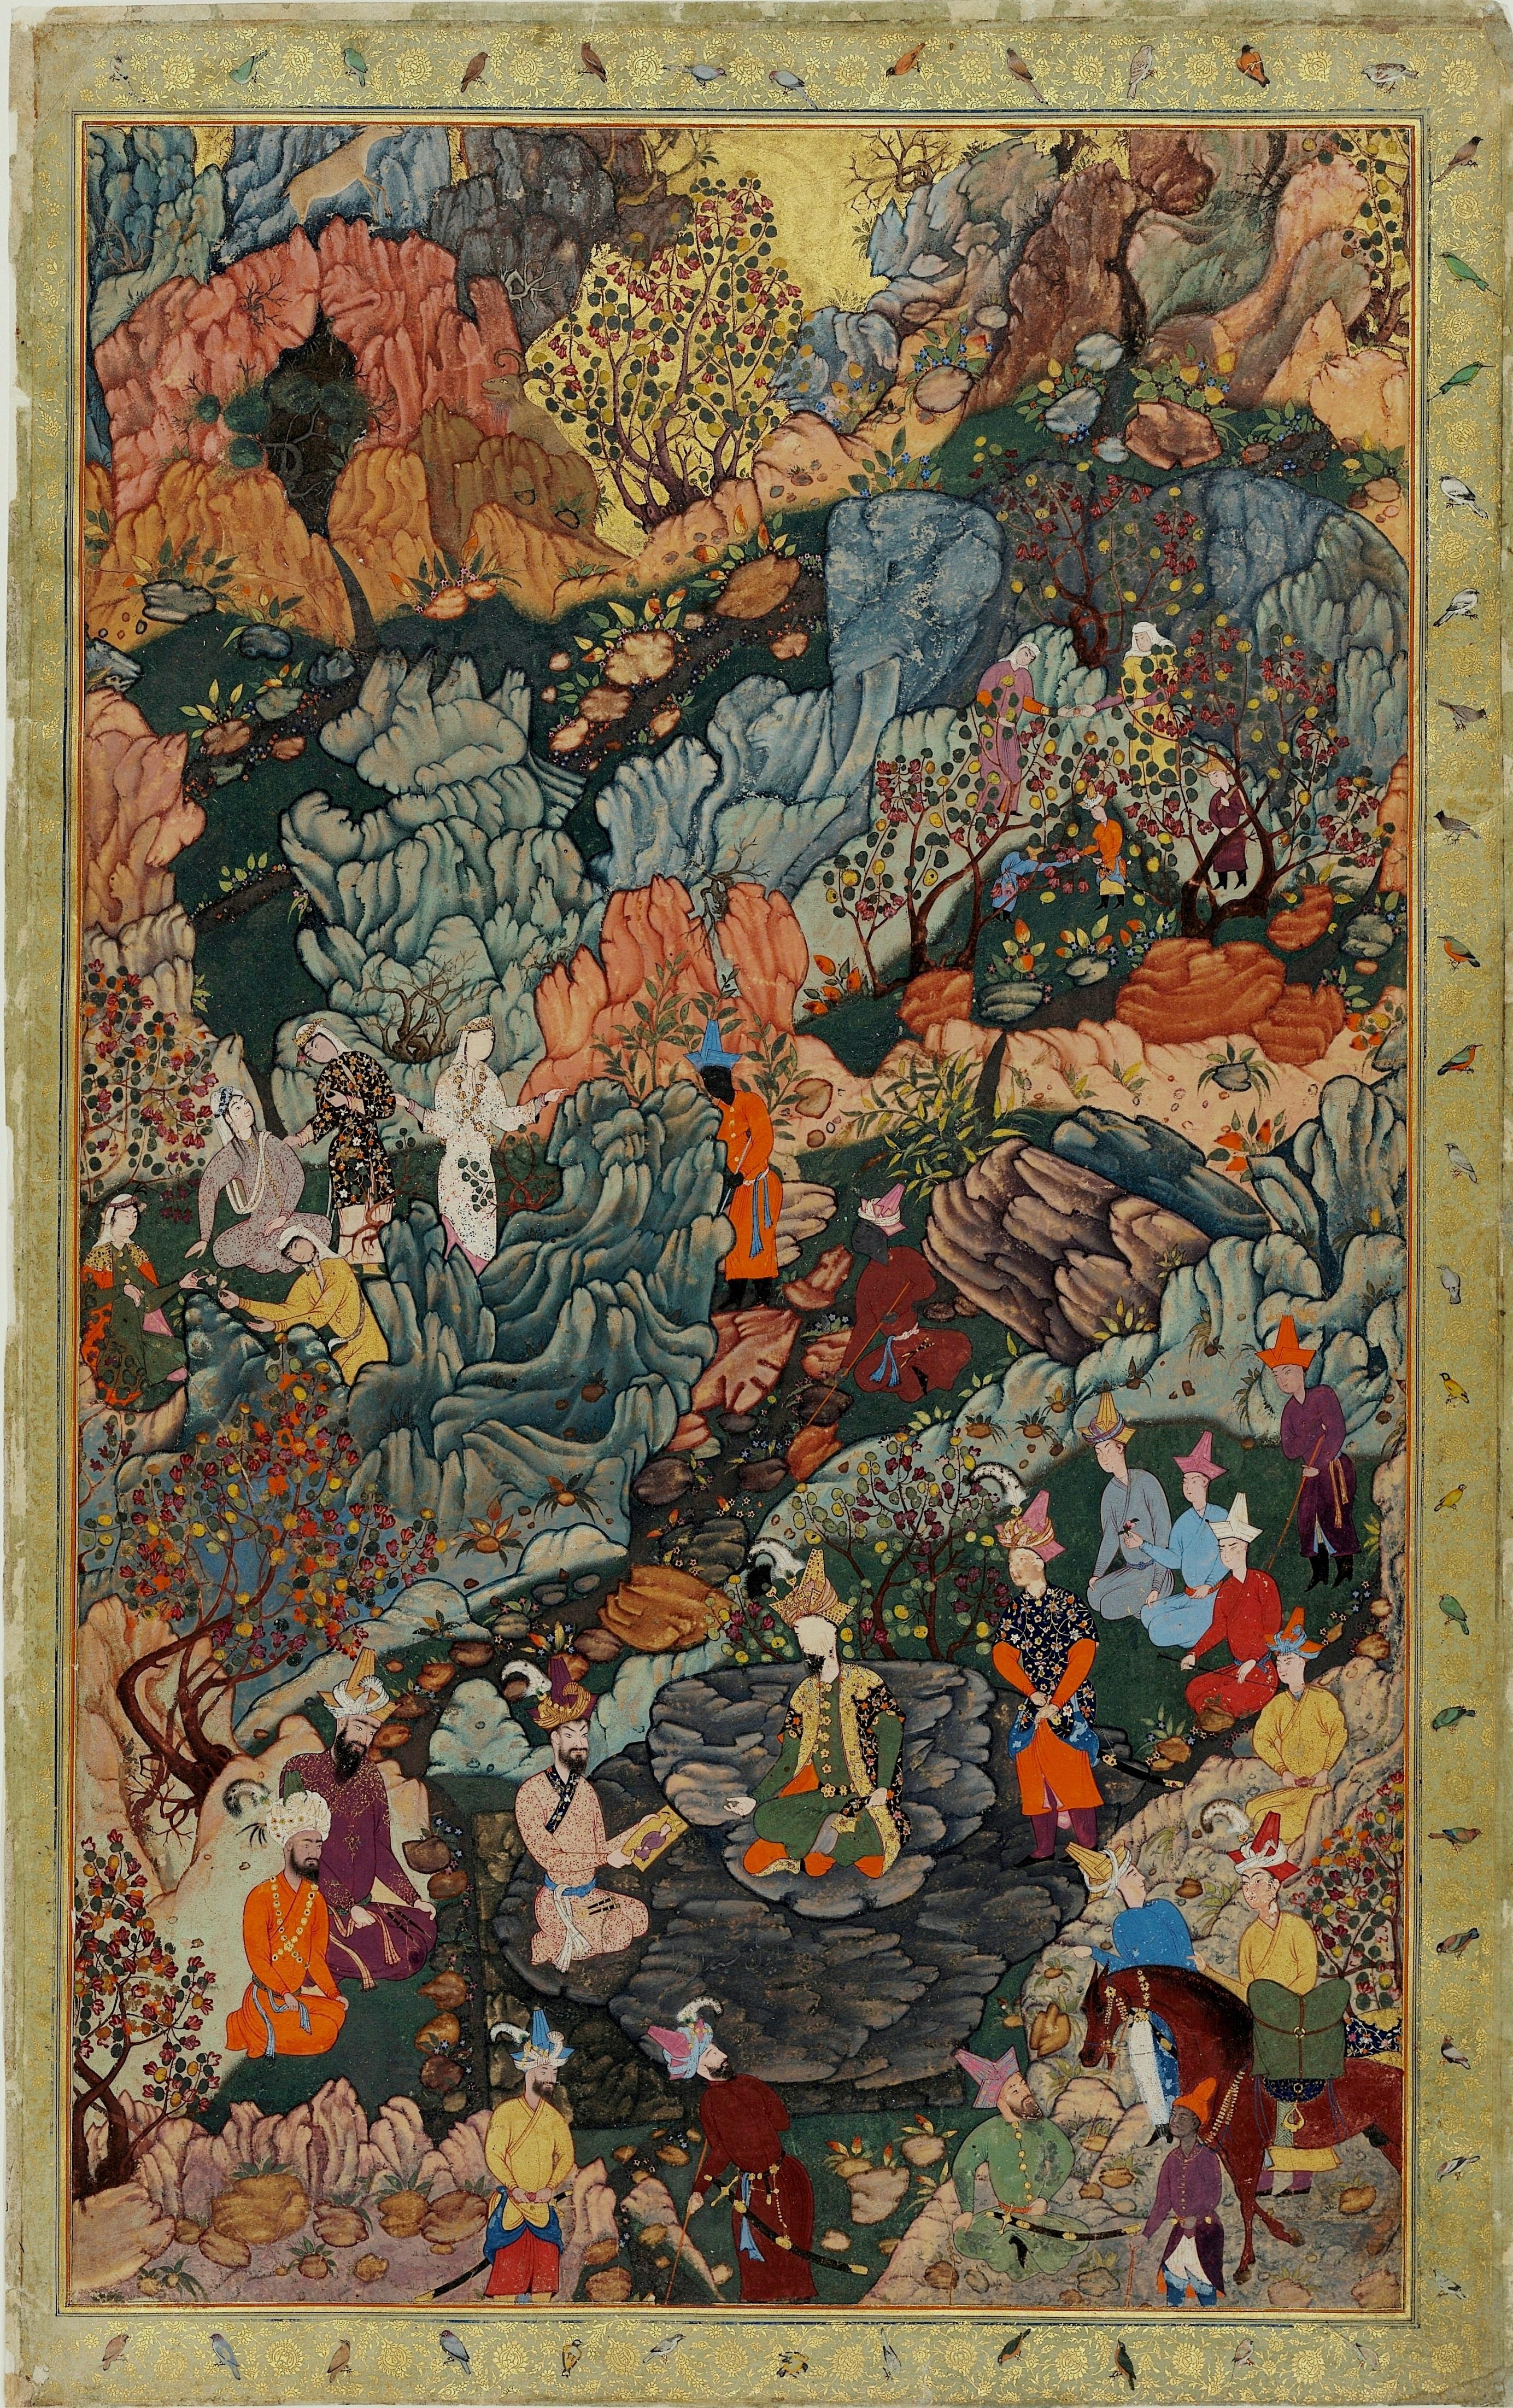 the Munir Hussain — a melodious singer